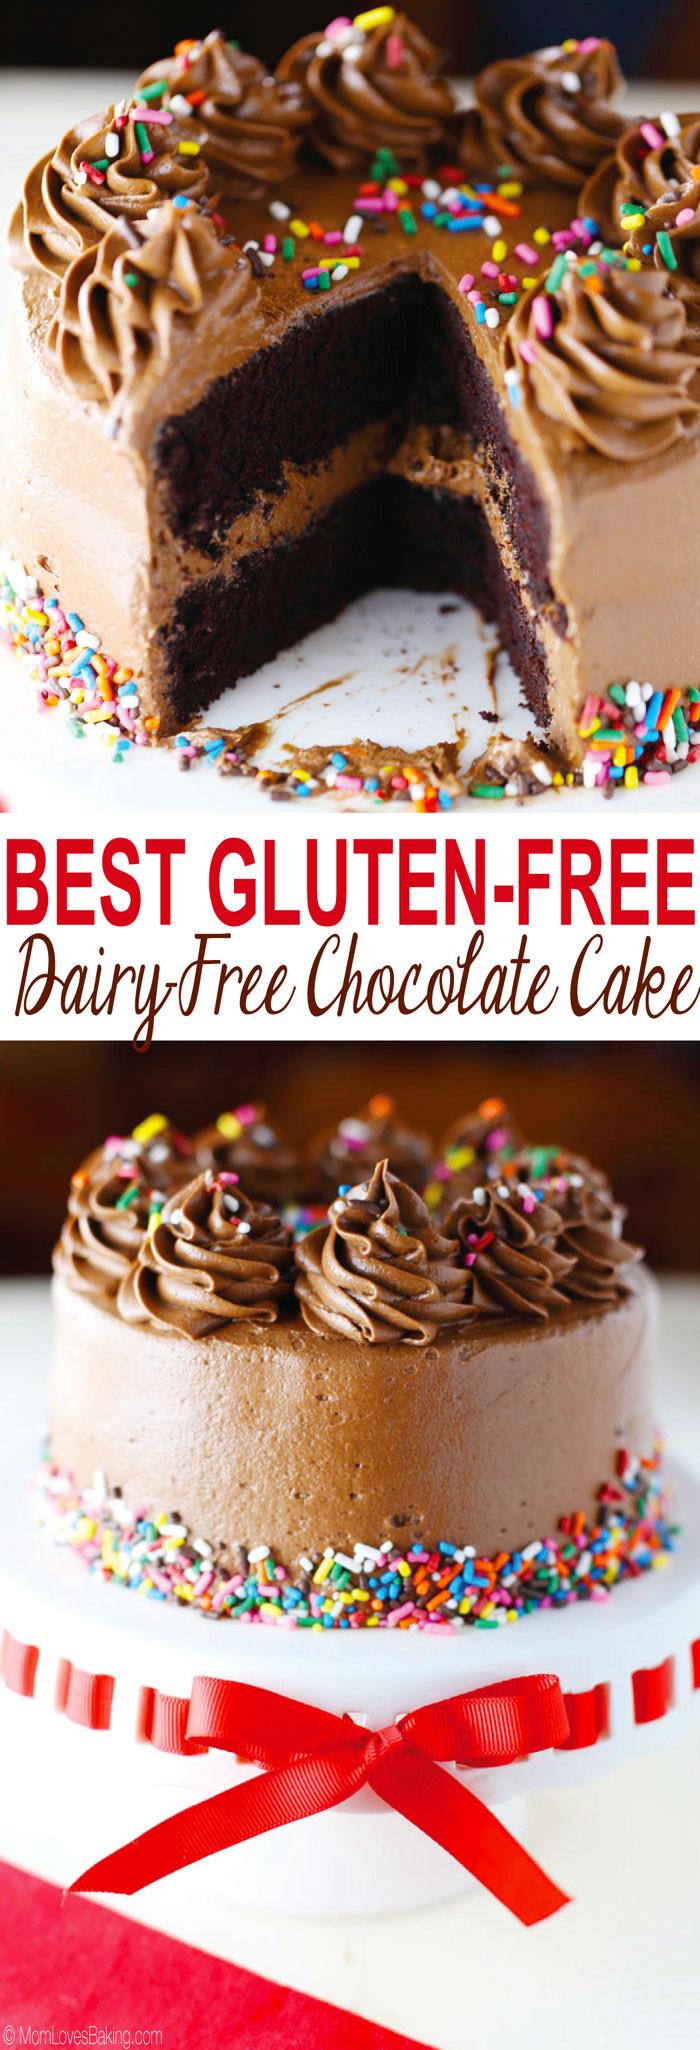 Gluten Free Dairy Free Birthday Cake  Best Gluten Free Dairy Free Chocolate Cake Mom Loves Baking